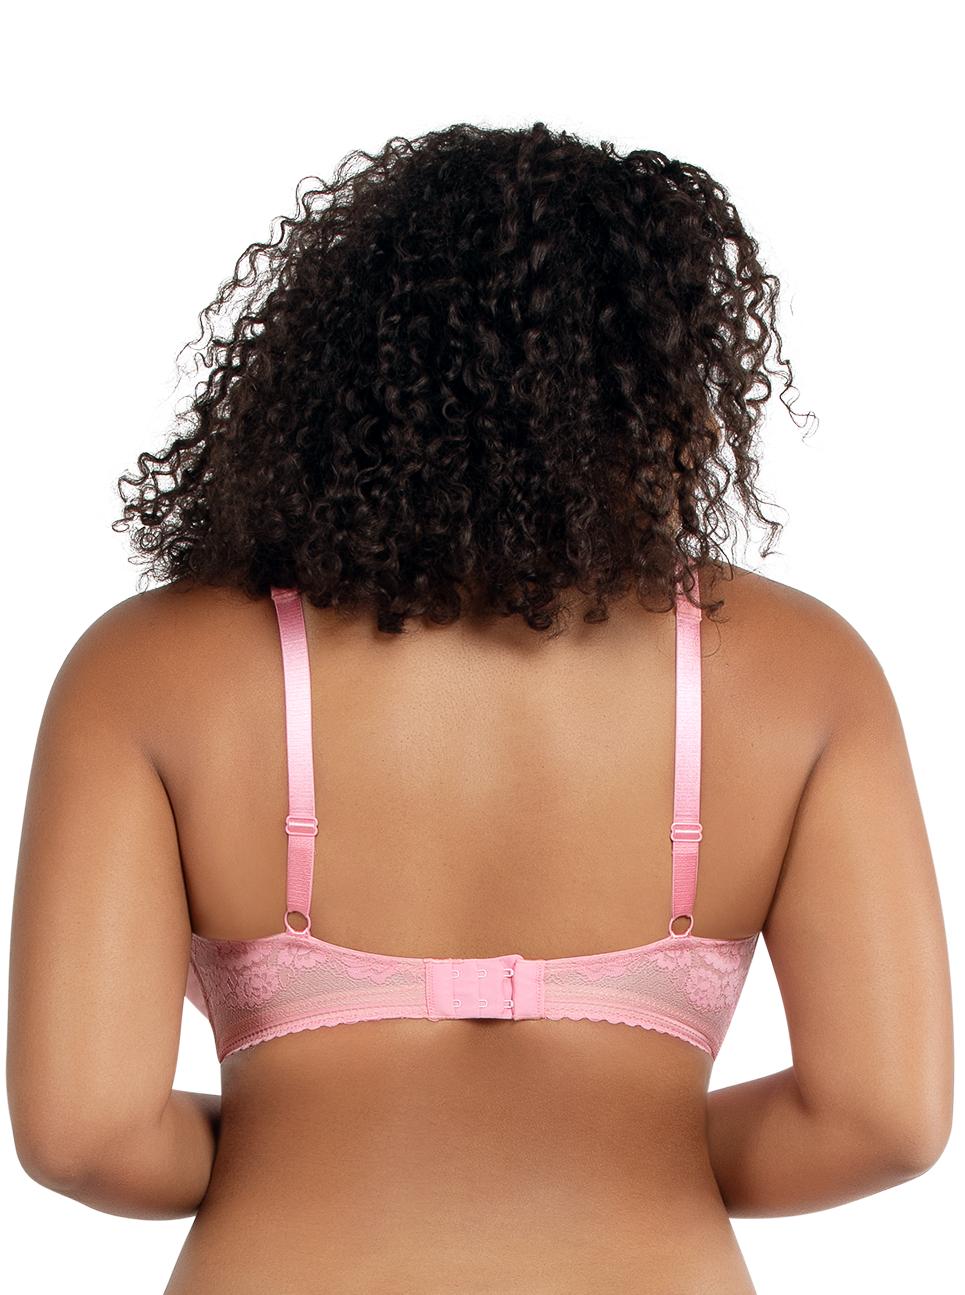 PARFAIT Jade PaddedBraletteA1651 FlamingoPink Back - Jade Padded Bralette Flamingo Pink A1651